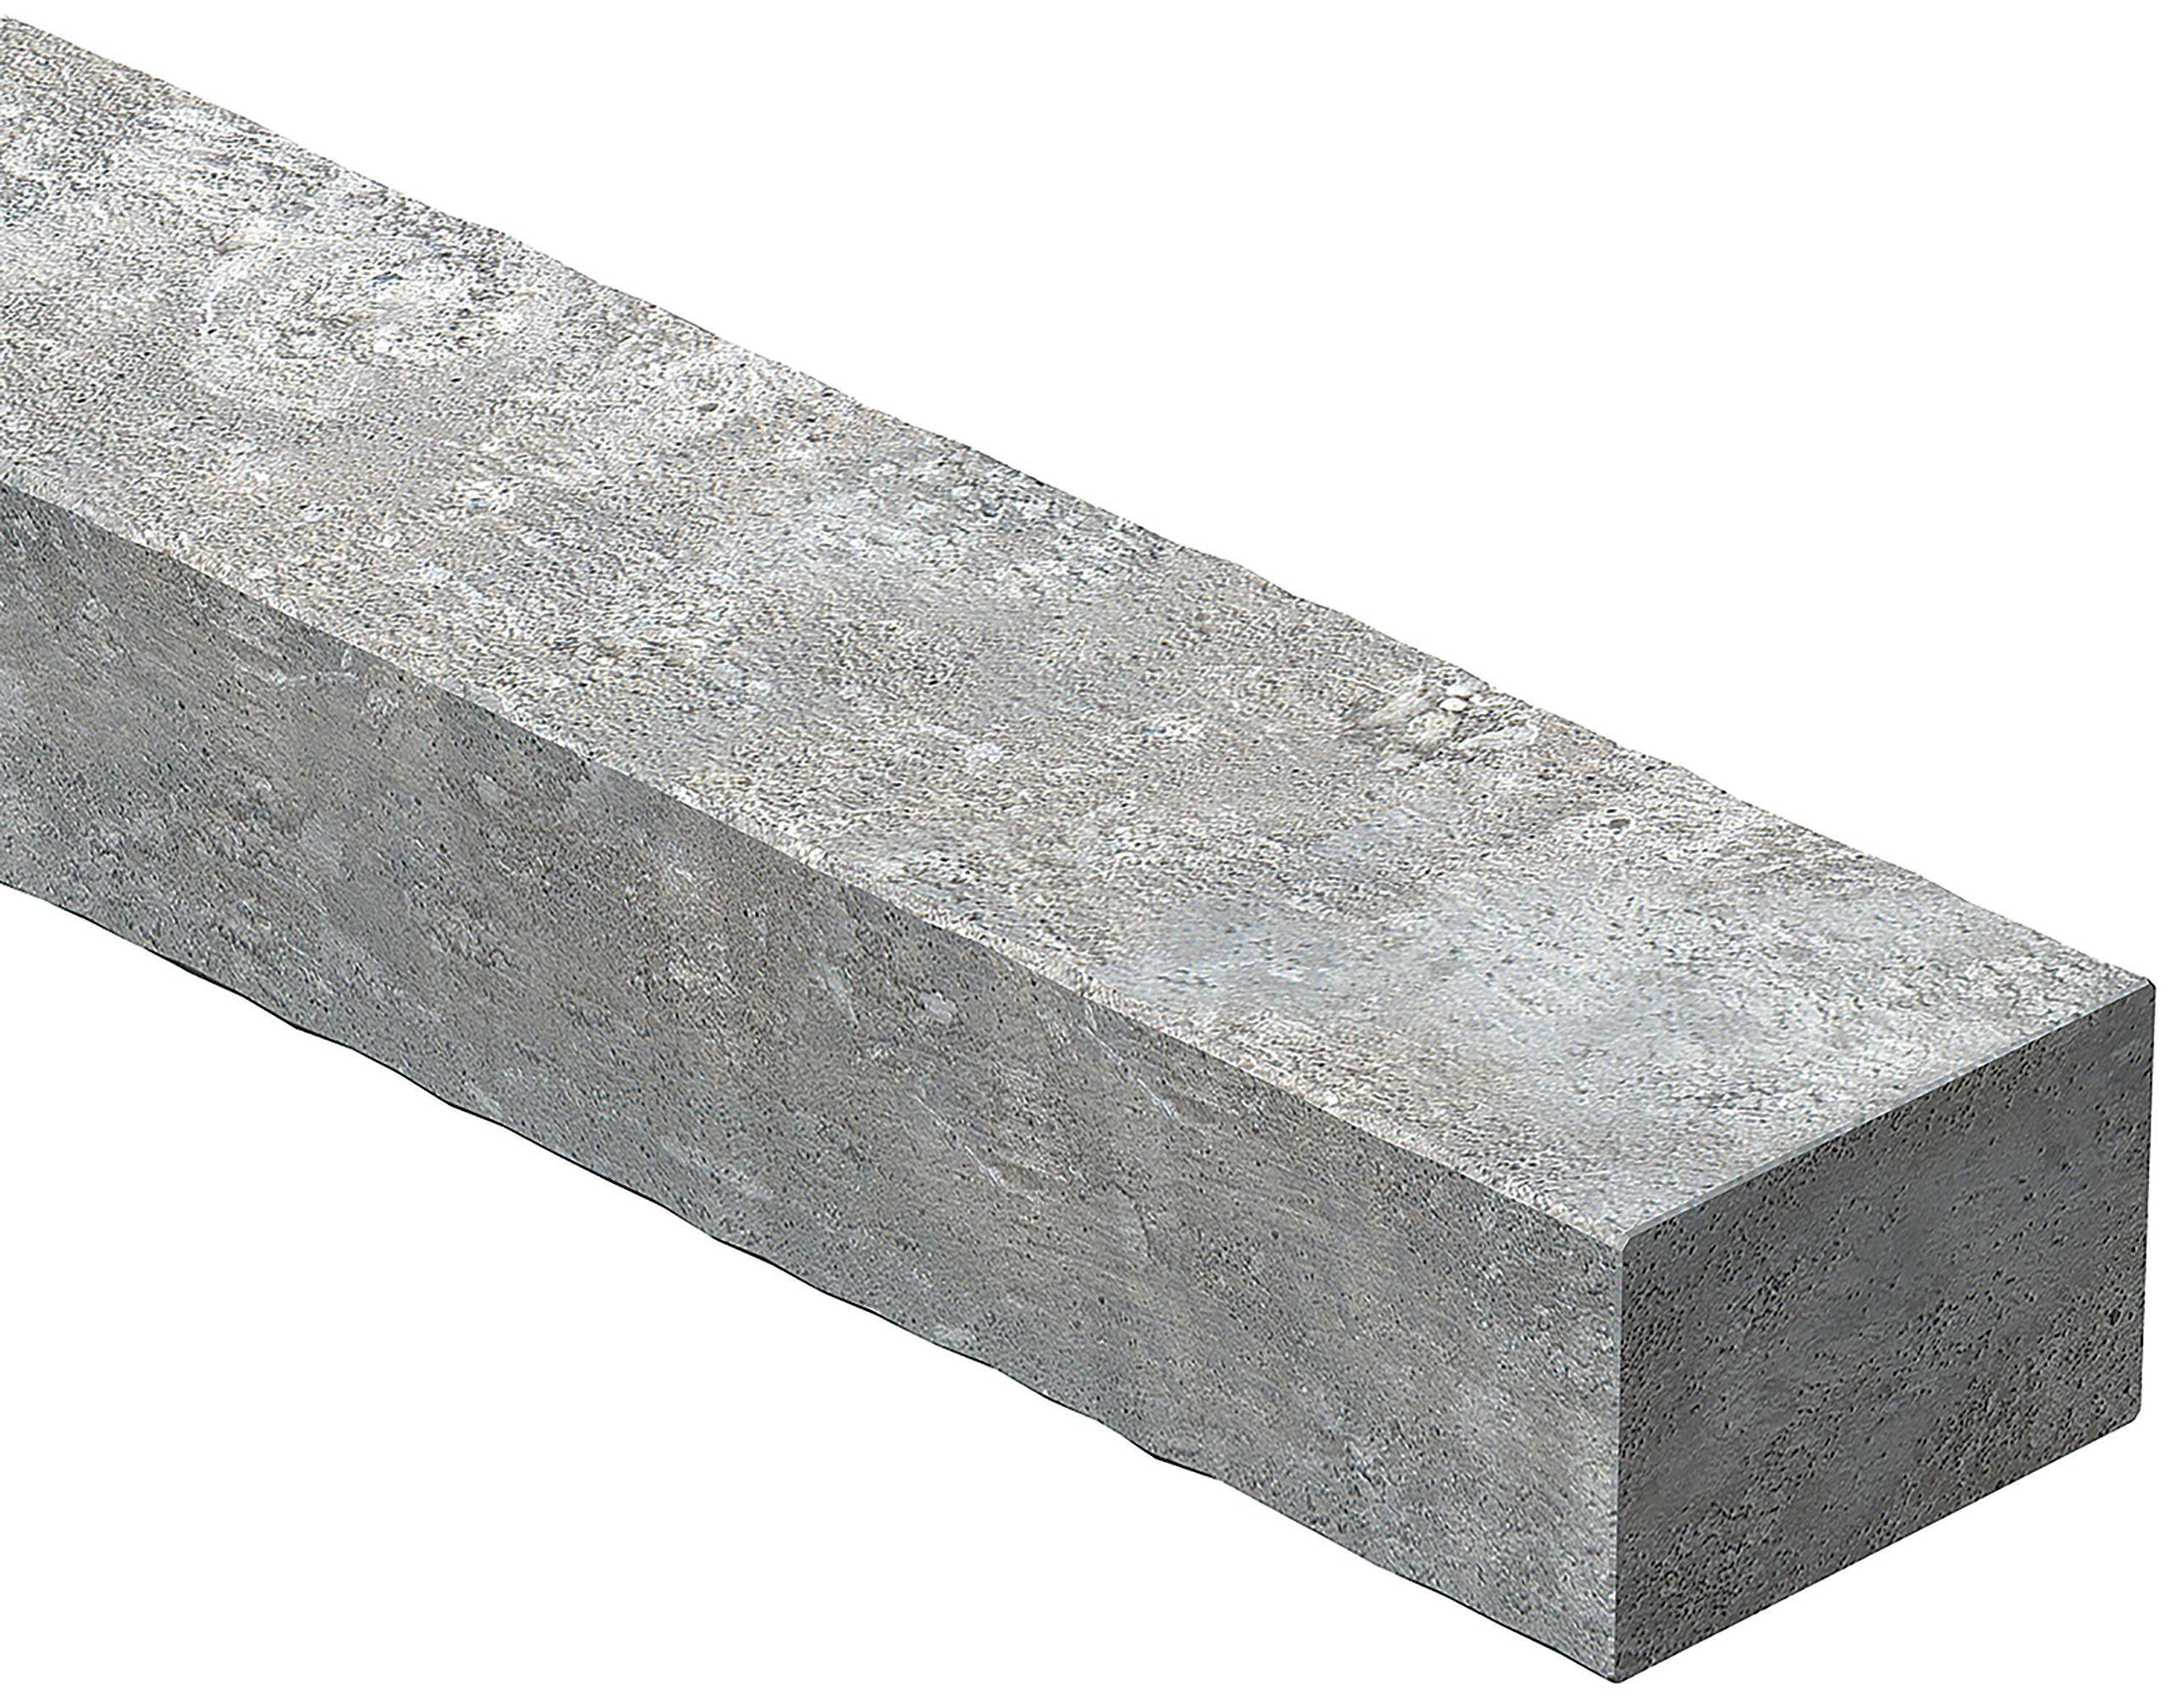 Ready Made Concrete : Expamet pre stressed reinforced concrete lintel l mm